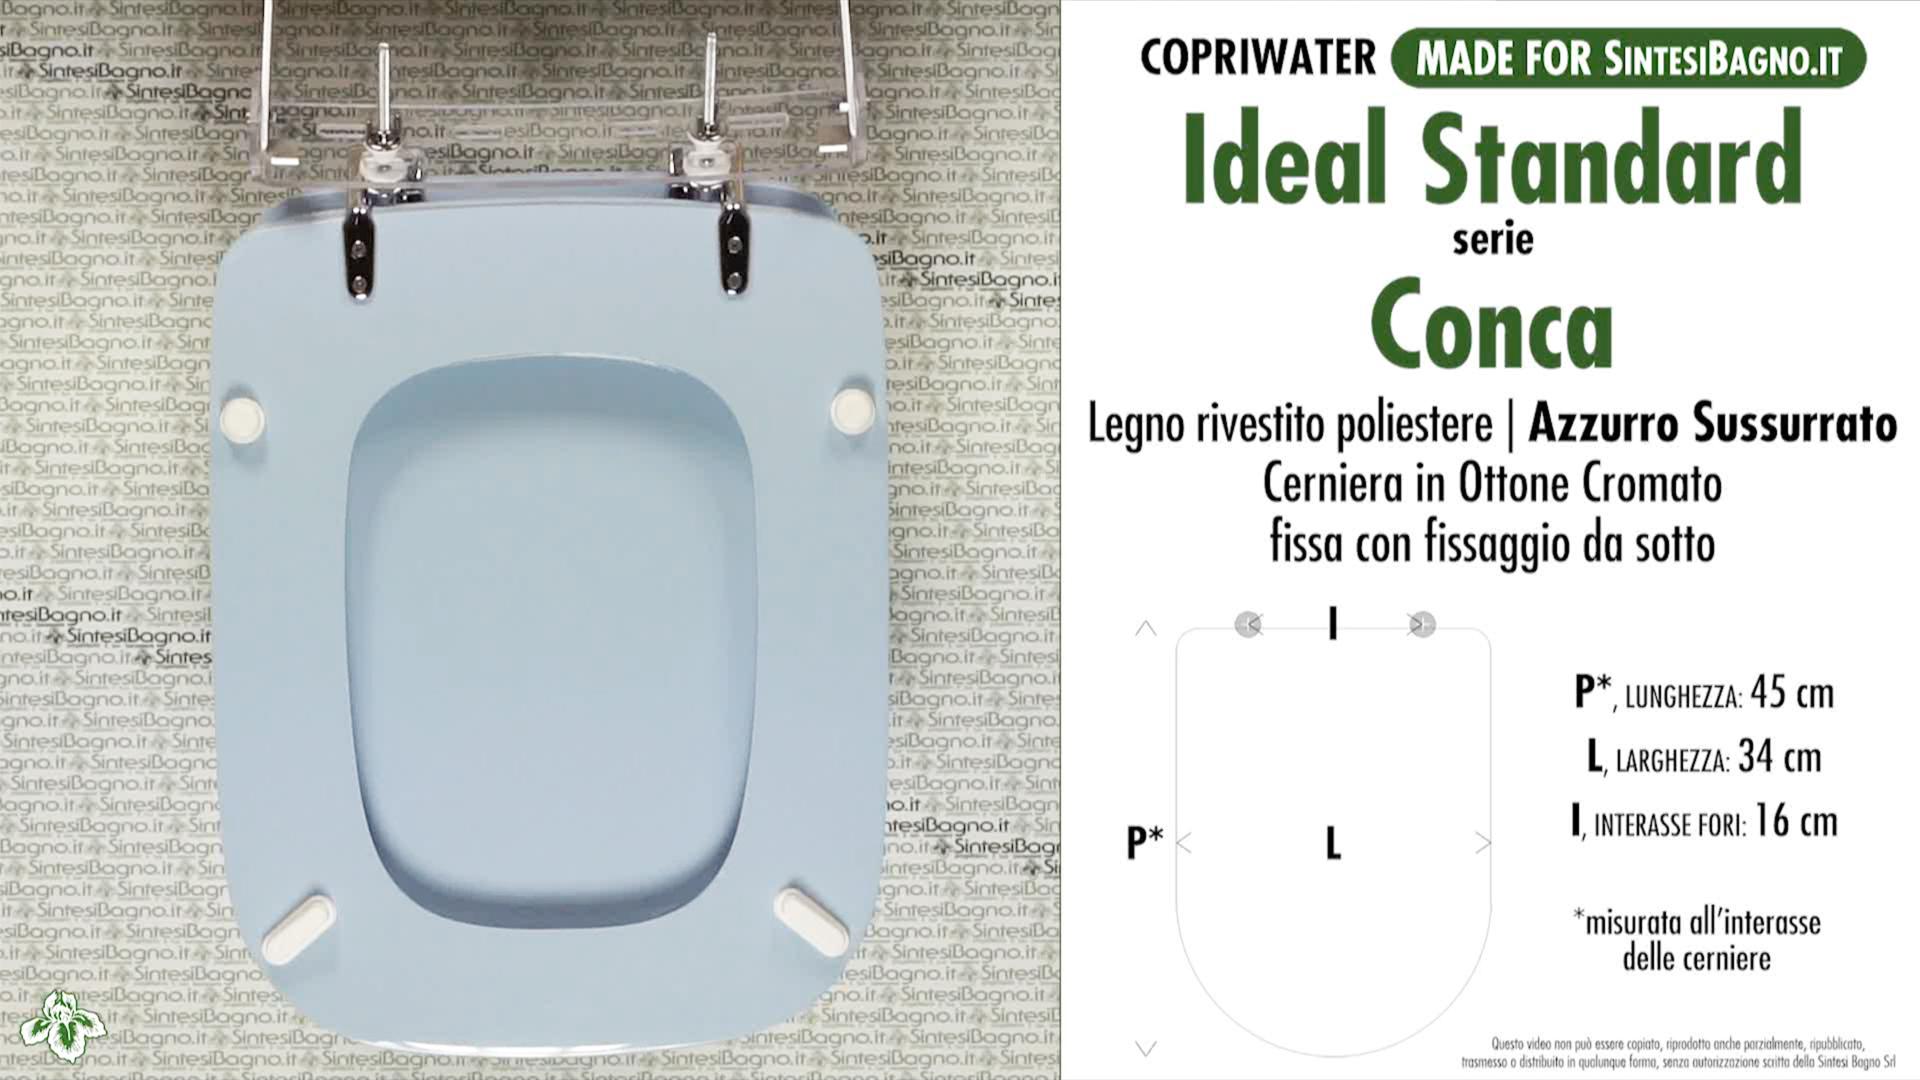 copriwater per vaso conca ideal standard azzurro sussurrato dilconconcaas ebay. Black Bedroom Furniture Sets. Home Design Ideas